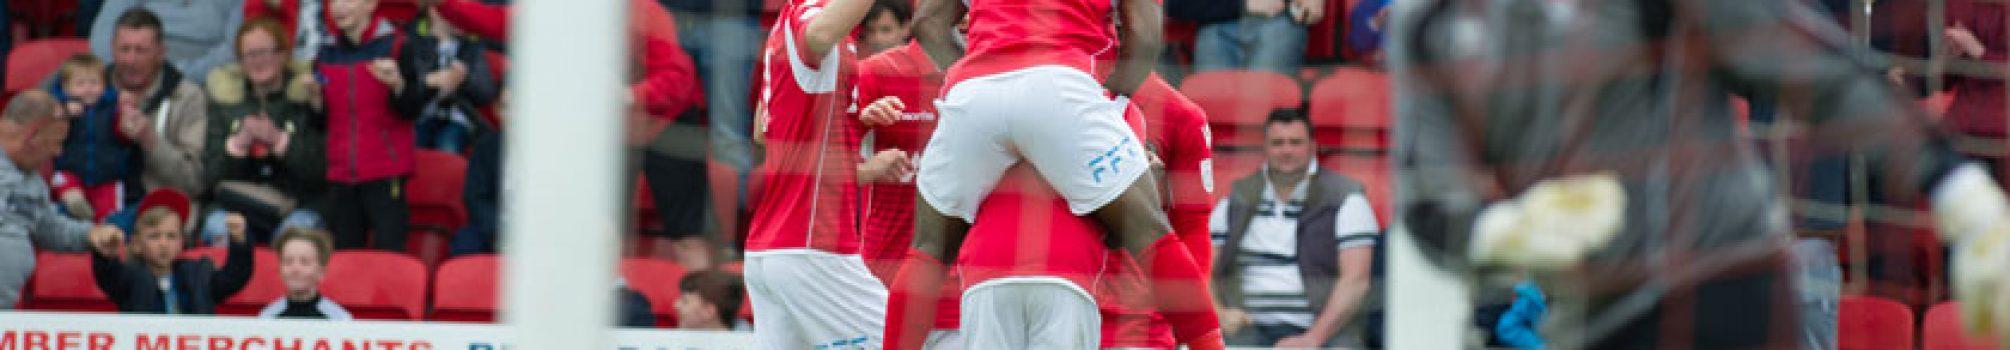 goal-oxford